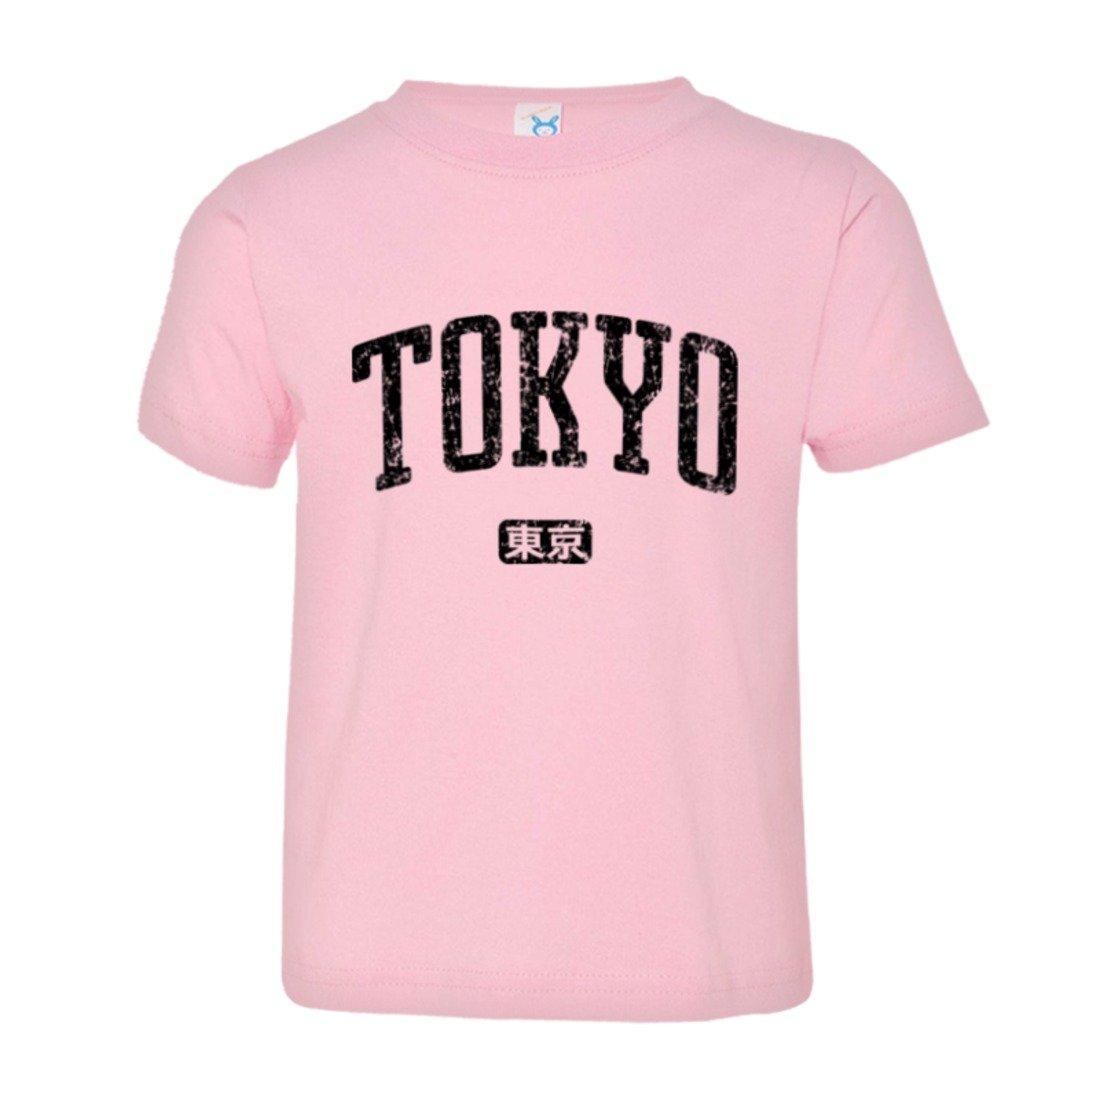 Toddler Tokyo Japan Vintage Classic Name Original HQ Tee Shirt